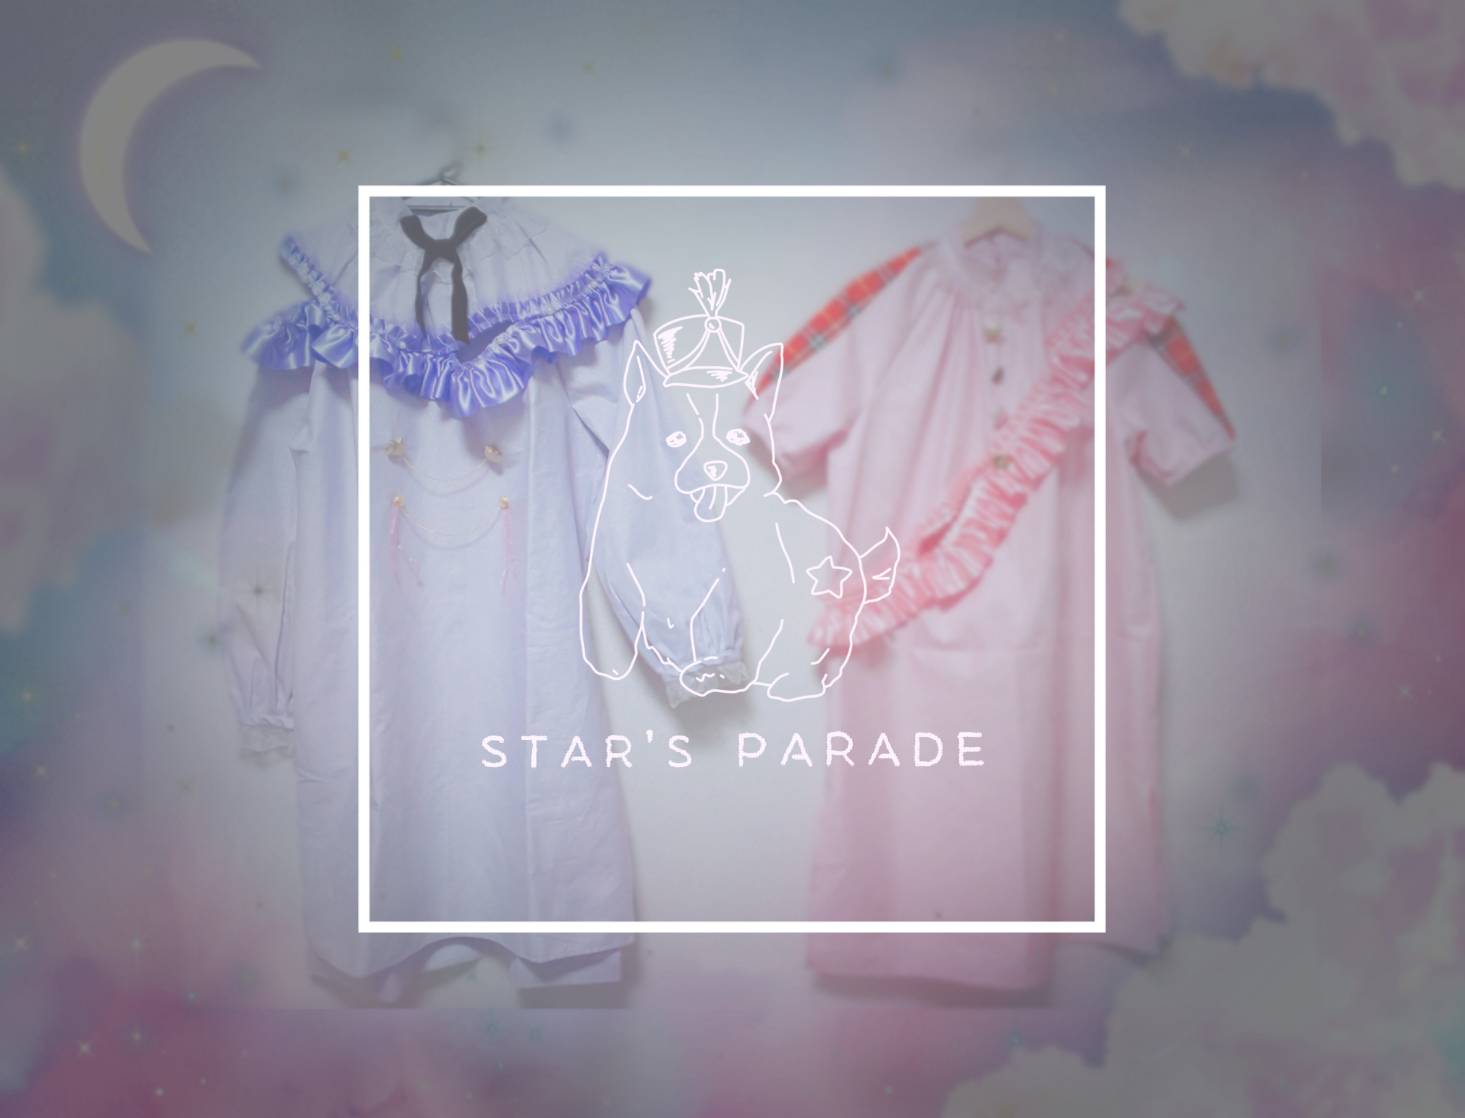 STAR'S PARADE